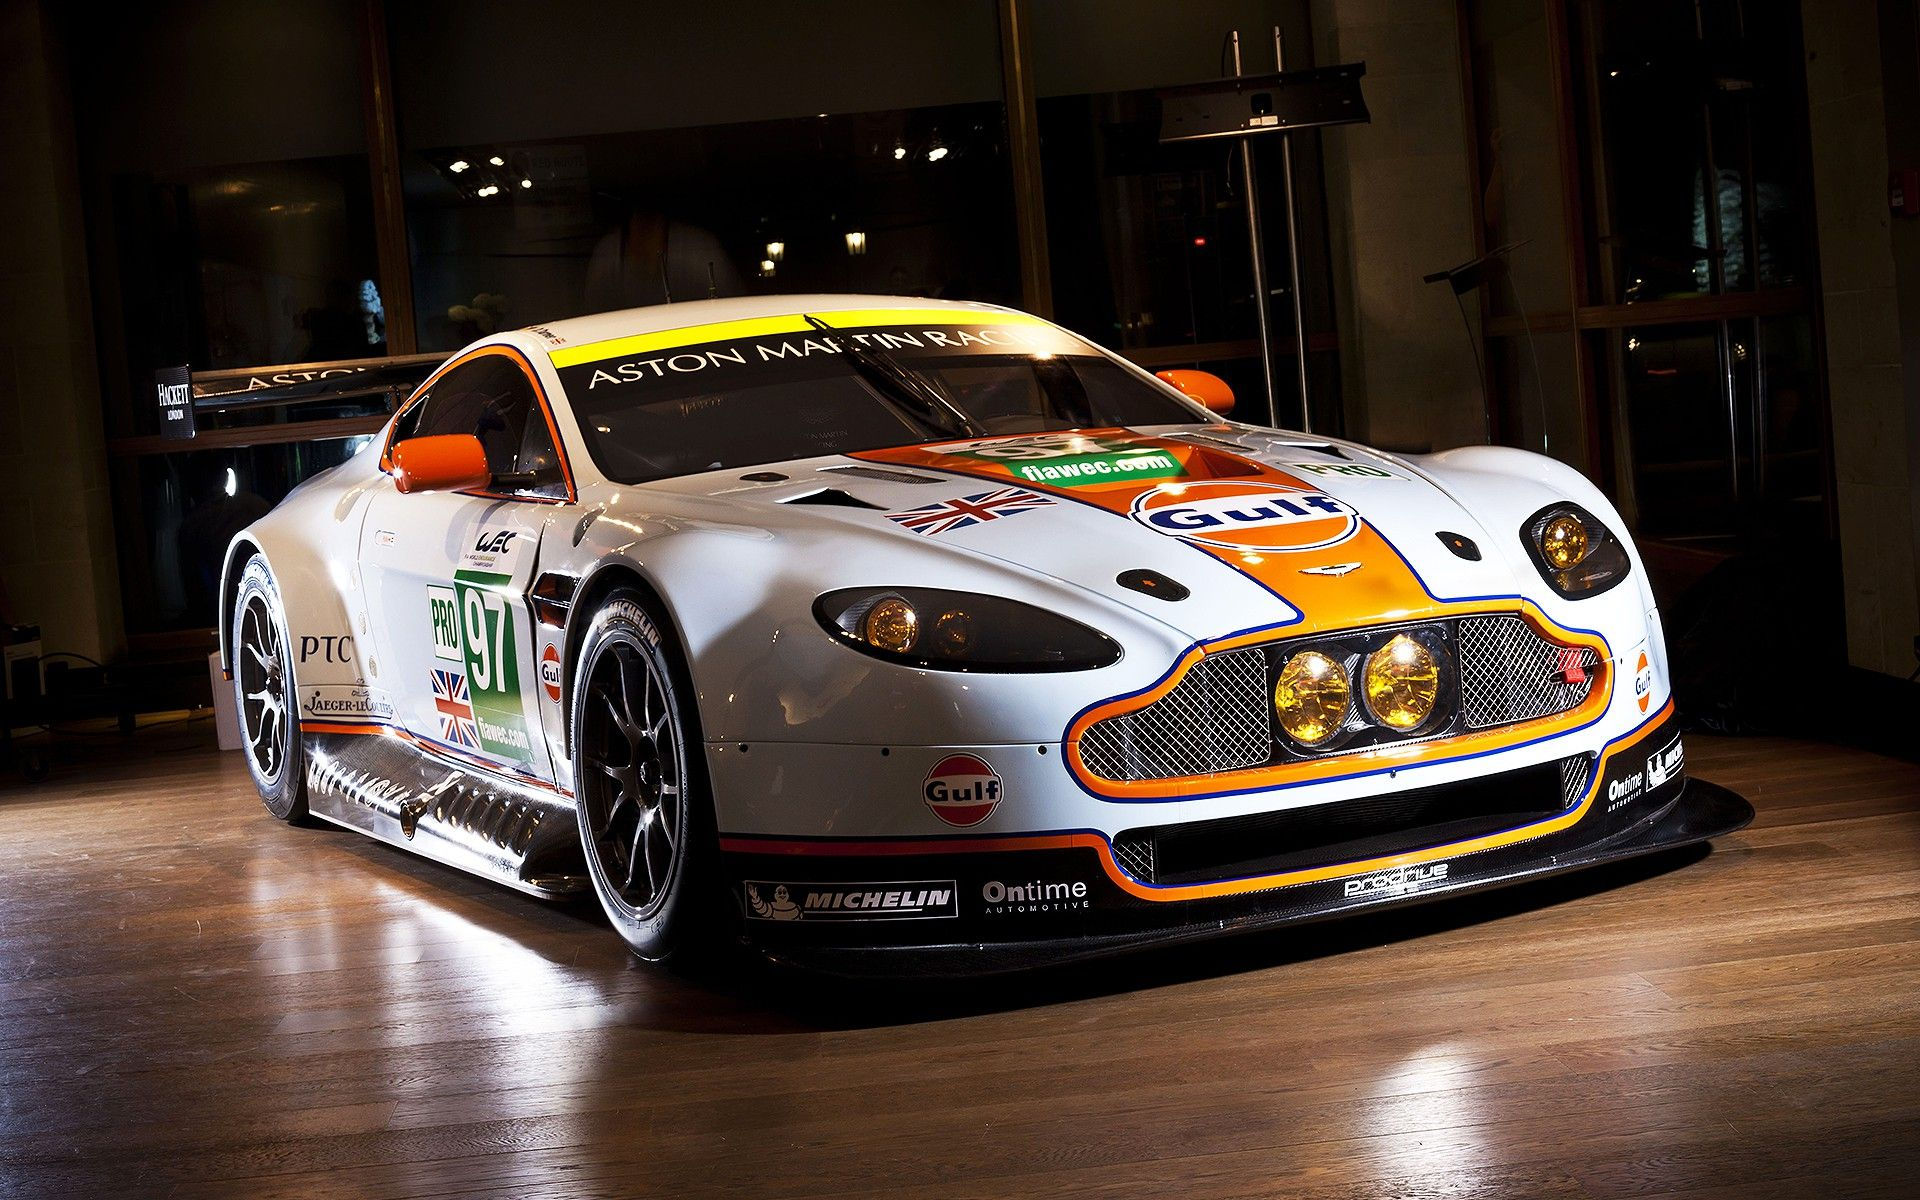 Aston Martin Racing V8 Vantage Gte Aston Martin Vantage Aston Martin New Aston Martin